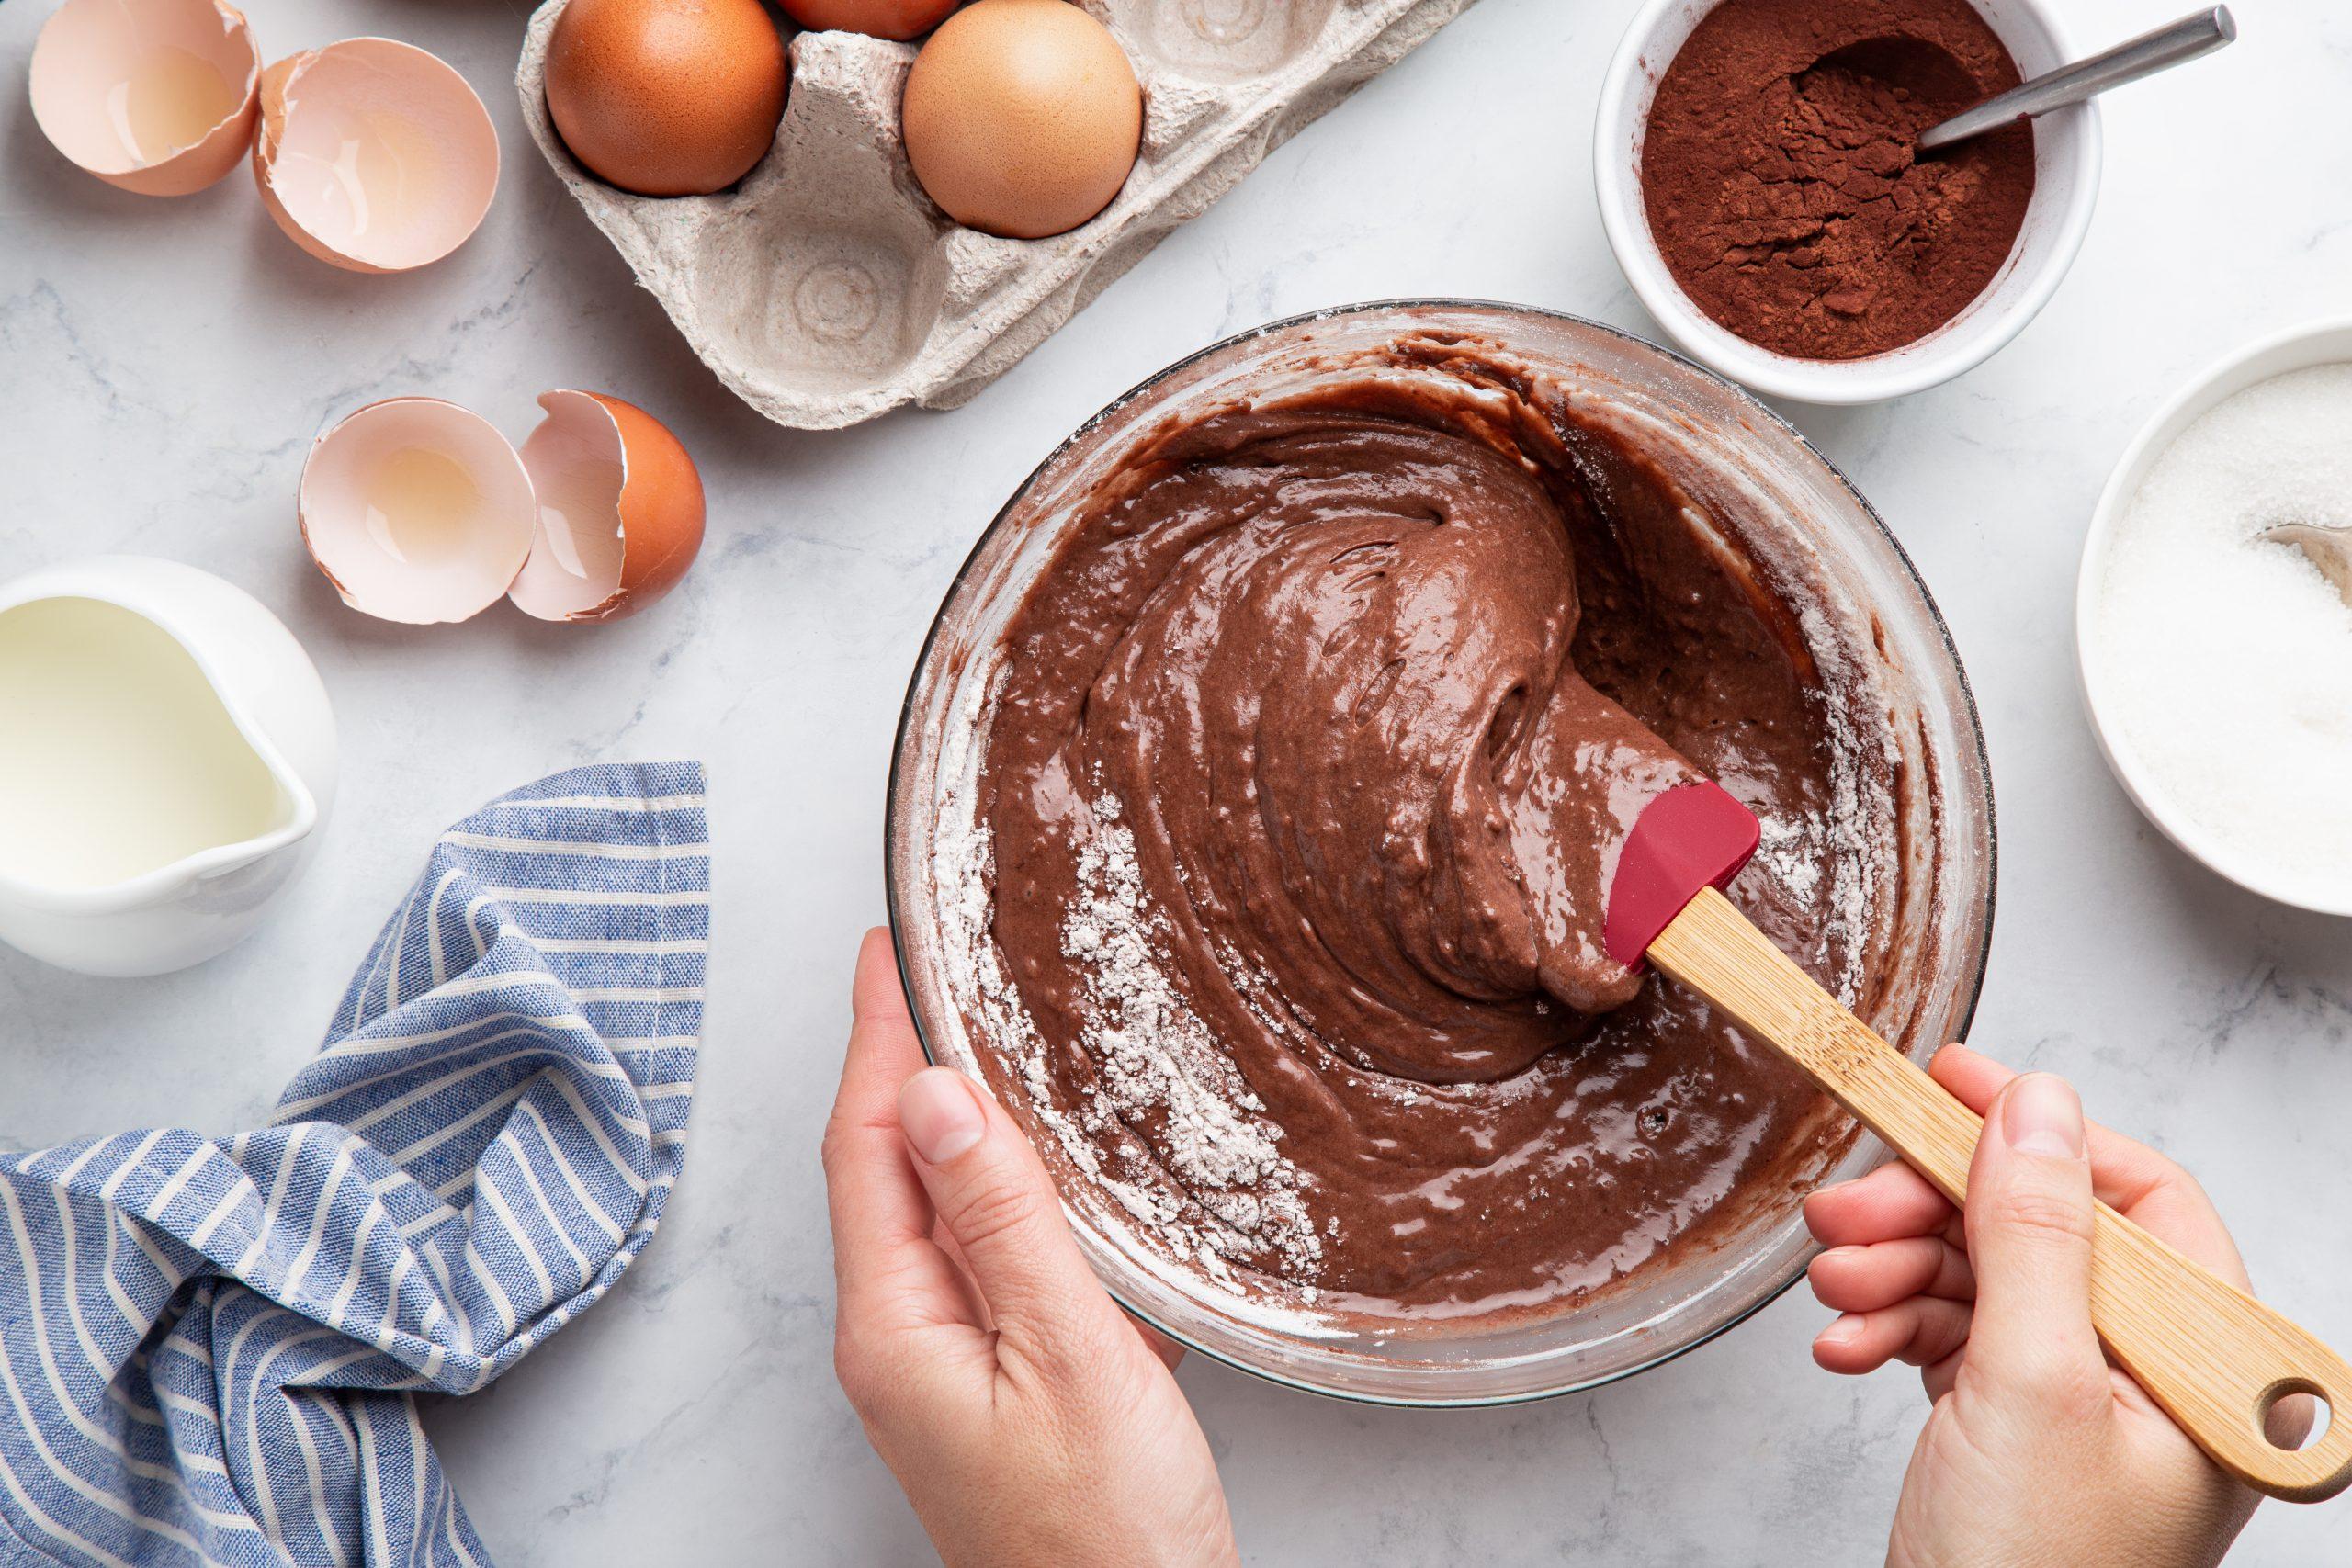 meilleur-gateau-au chocolat-wooloo_ingredients